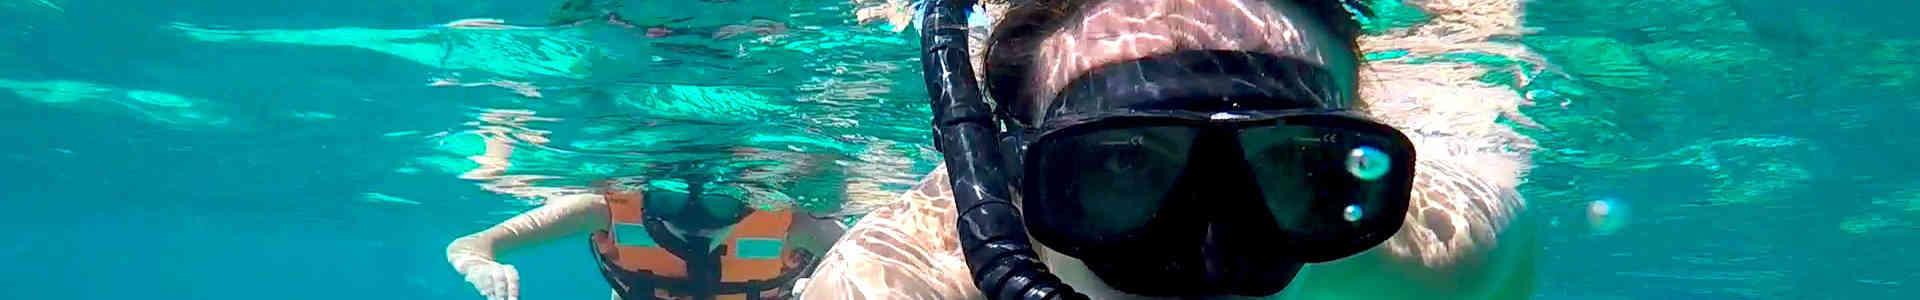 beach-villas-zanzibar-snorkeling